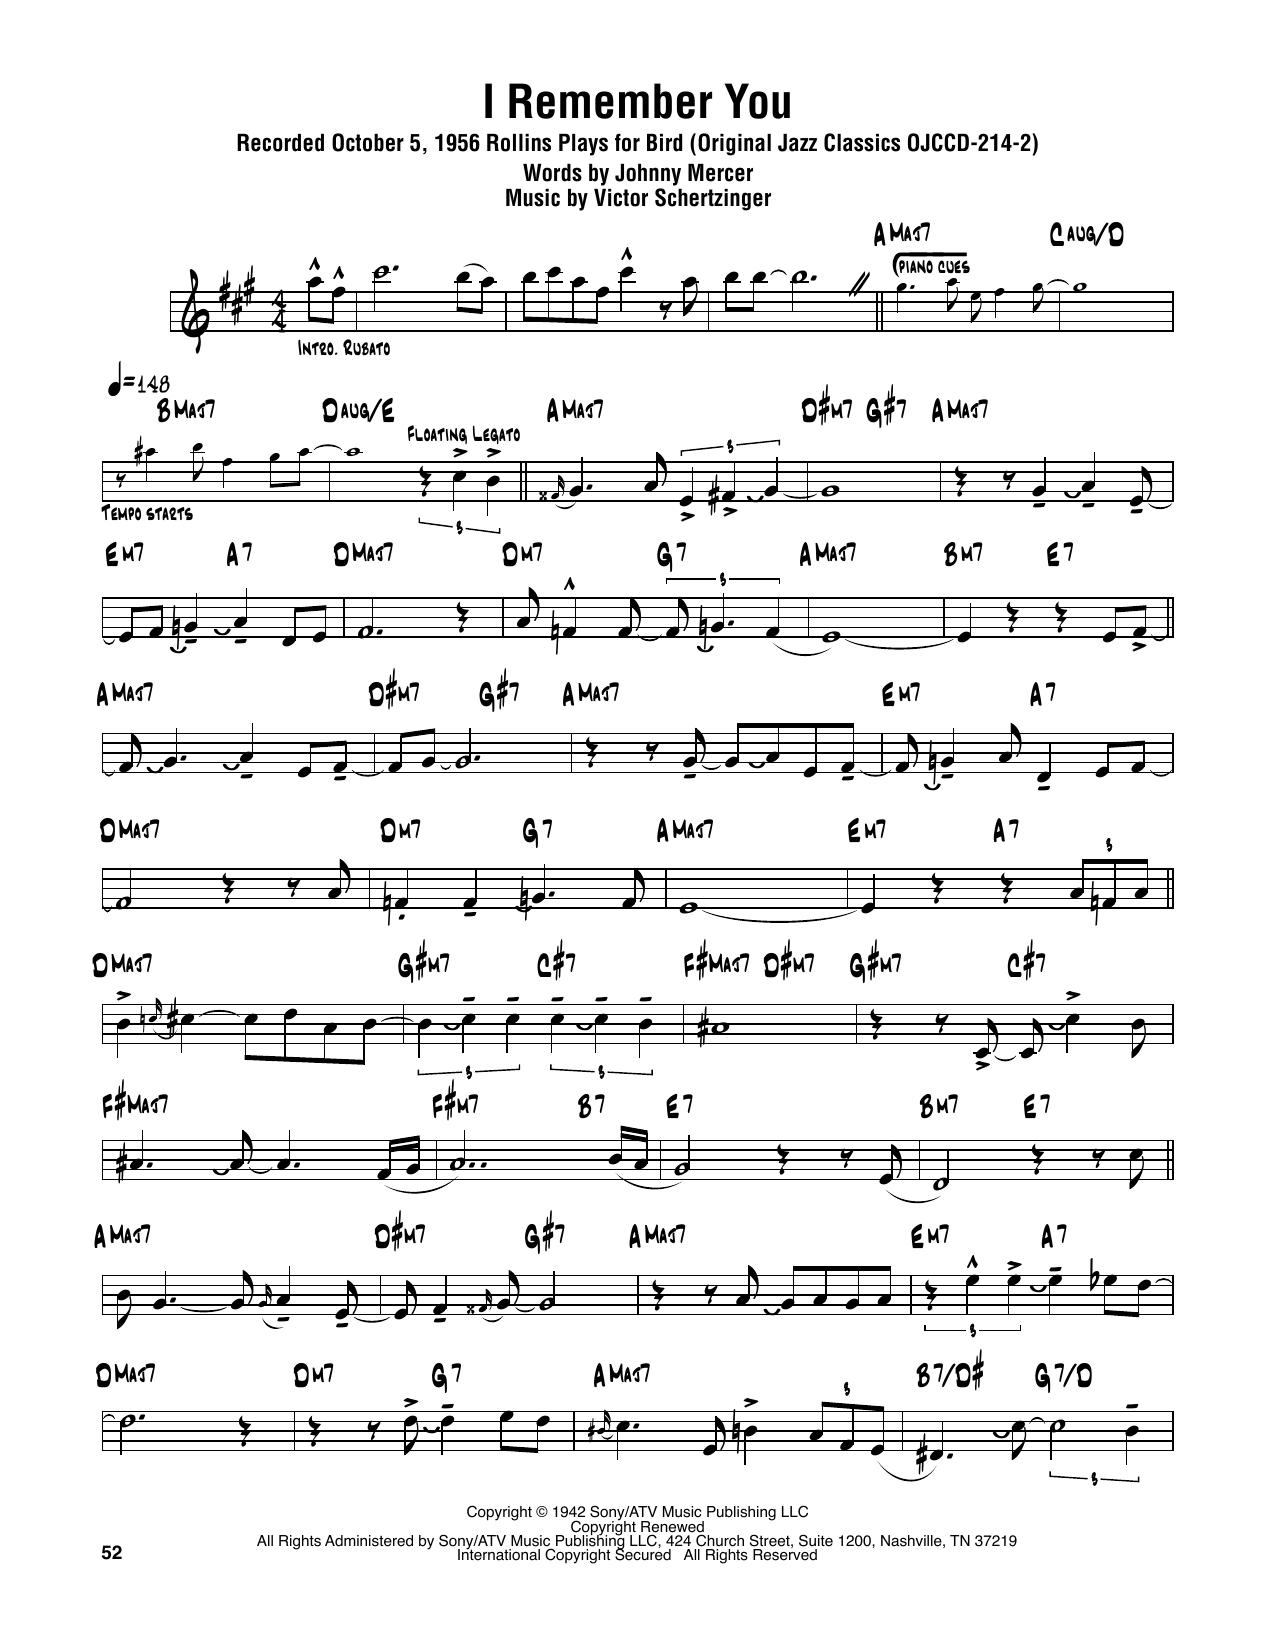 Sonny Rollins 'I Remember You' Sheet Music Notes, Chords   Download  Printable Tenor Sax Transcription - SKU: 374348